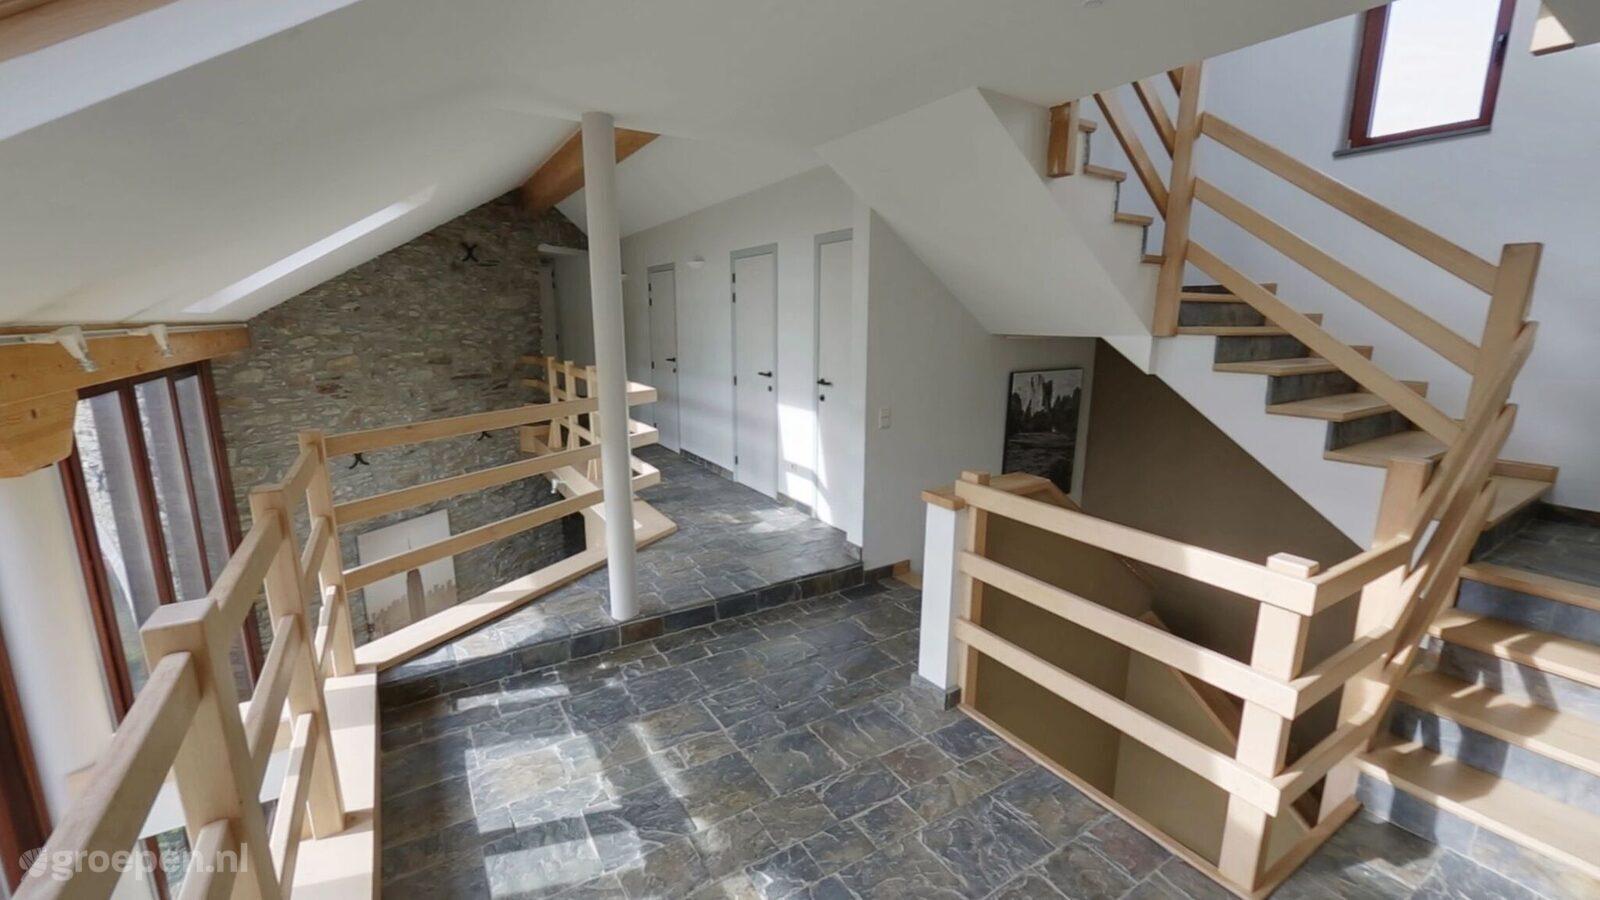 Group accommodation Ortho, La Roche-en-Ardenne